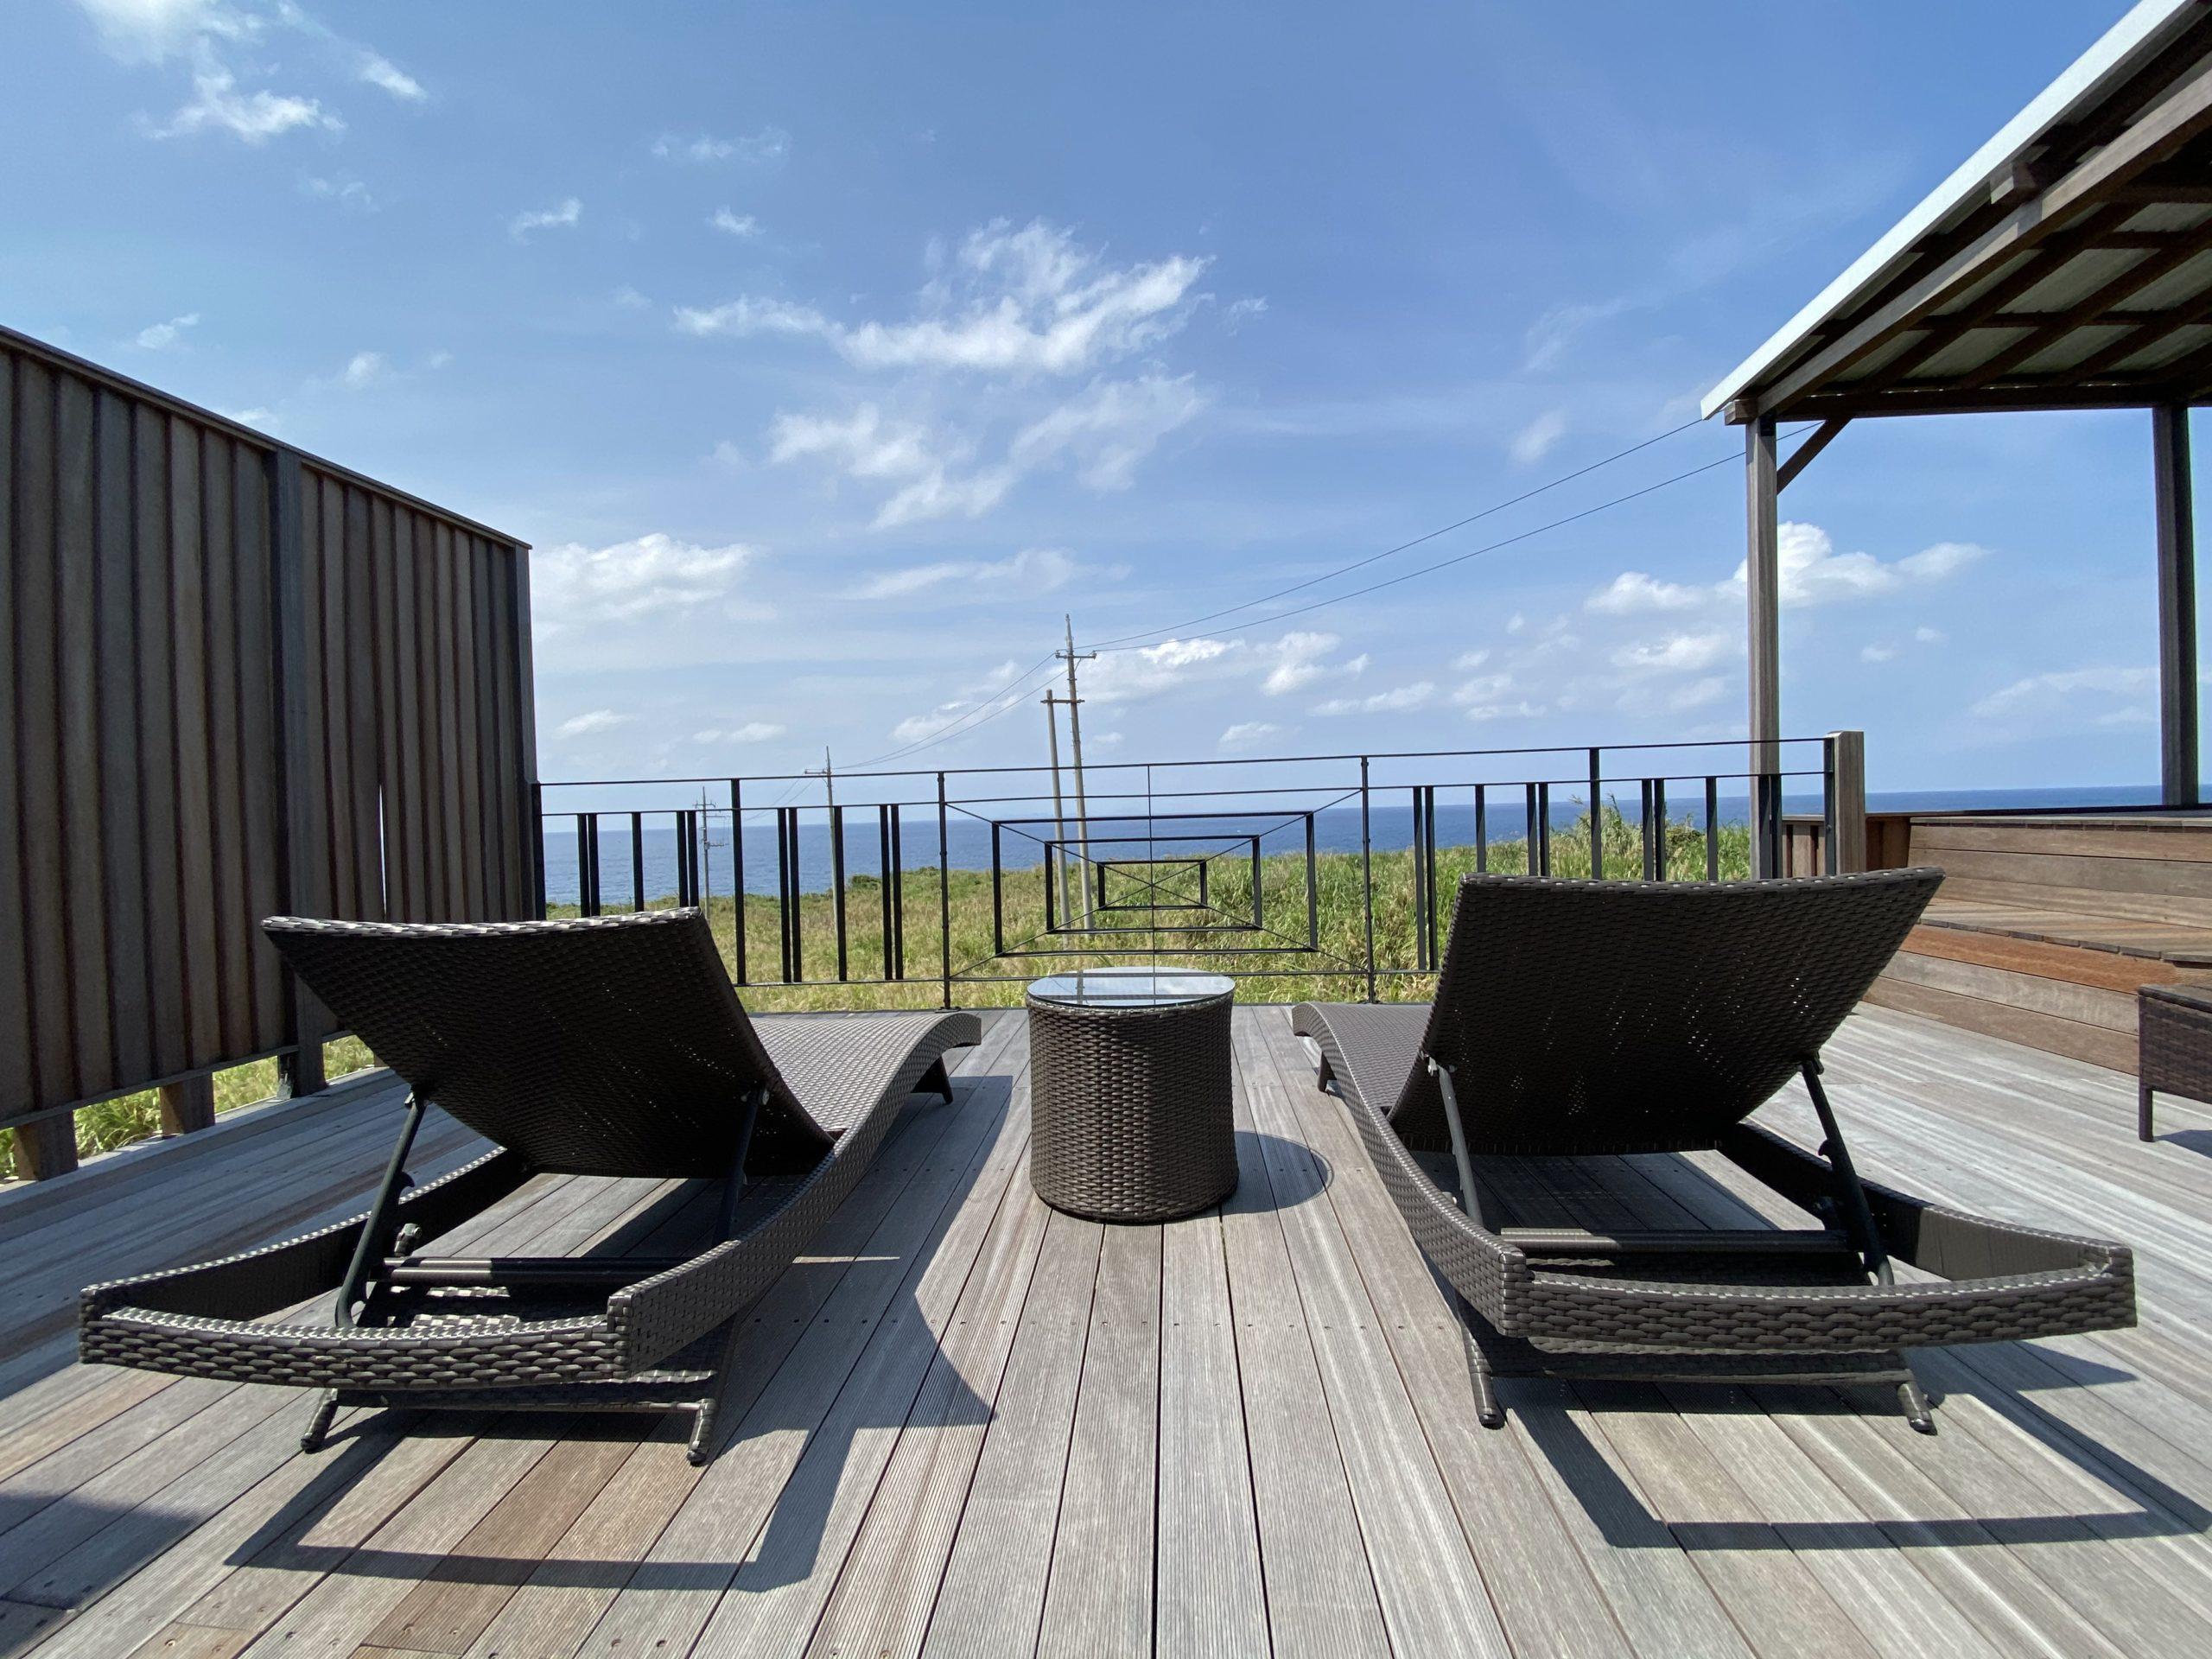 isola villa kouri (イゾラヴィラコウリ)古宇利島ホテル levante